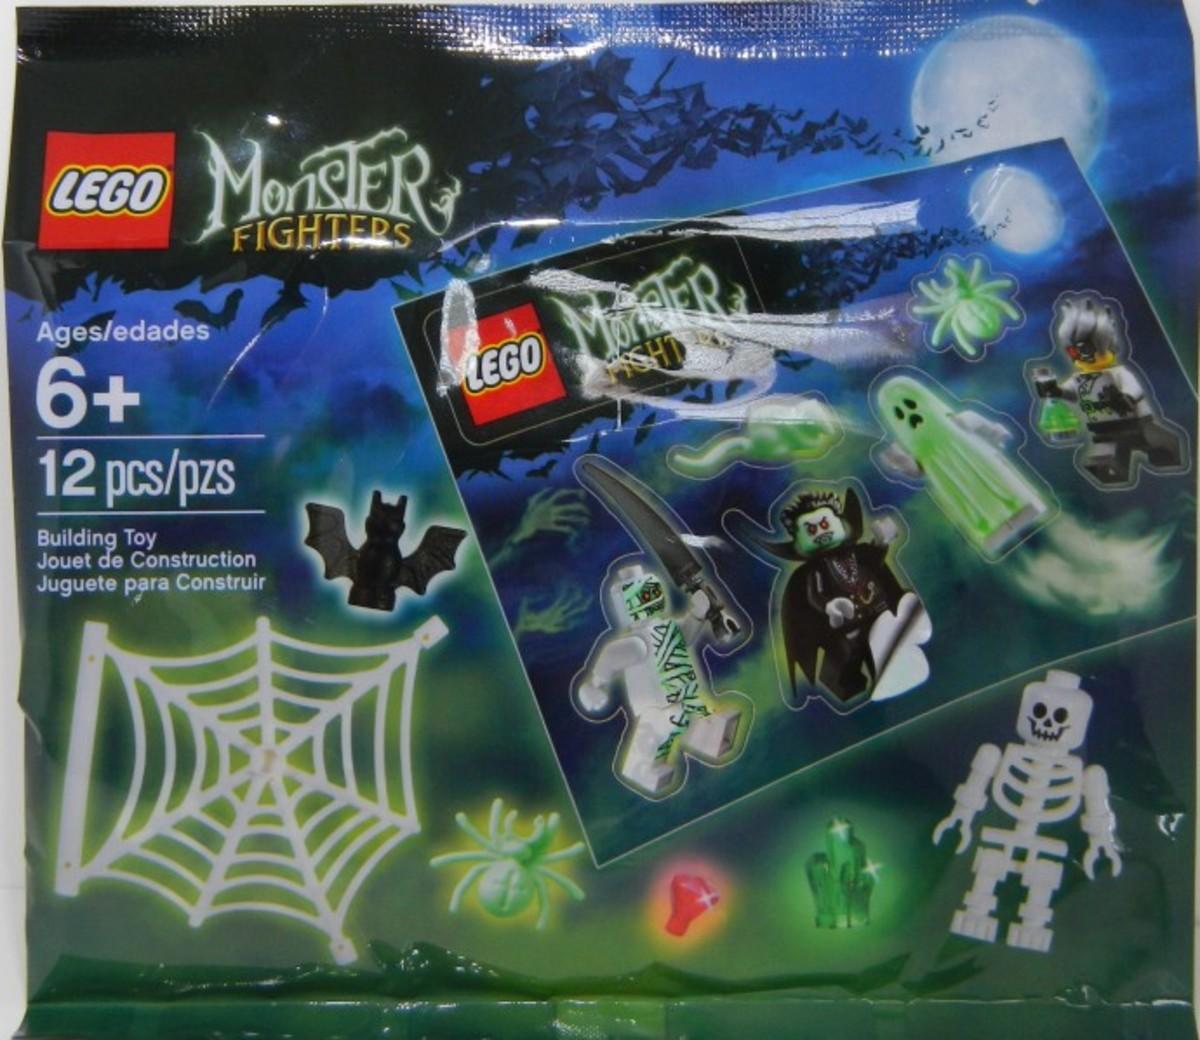 LEGO Monster Fighters Promotional Pack 5000644 Bag